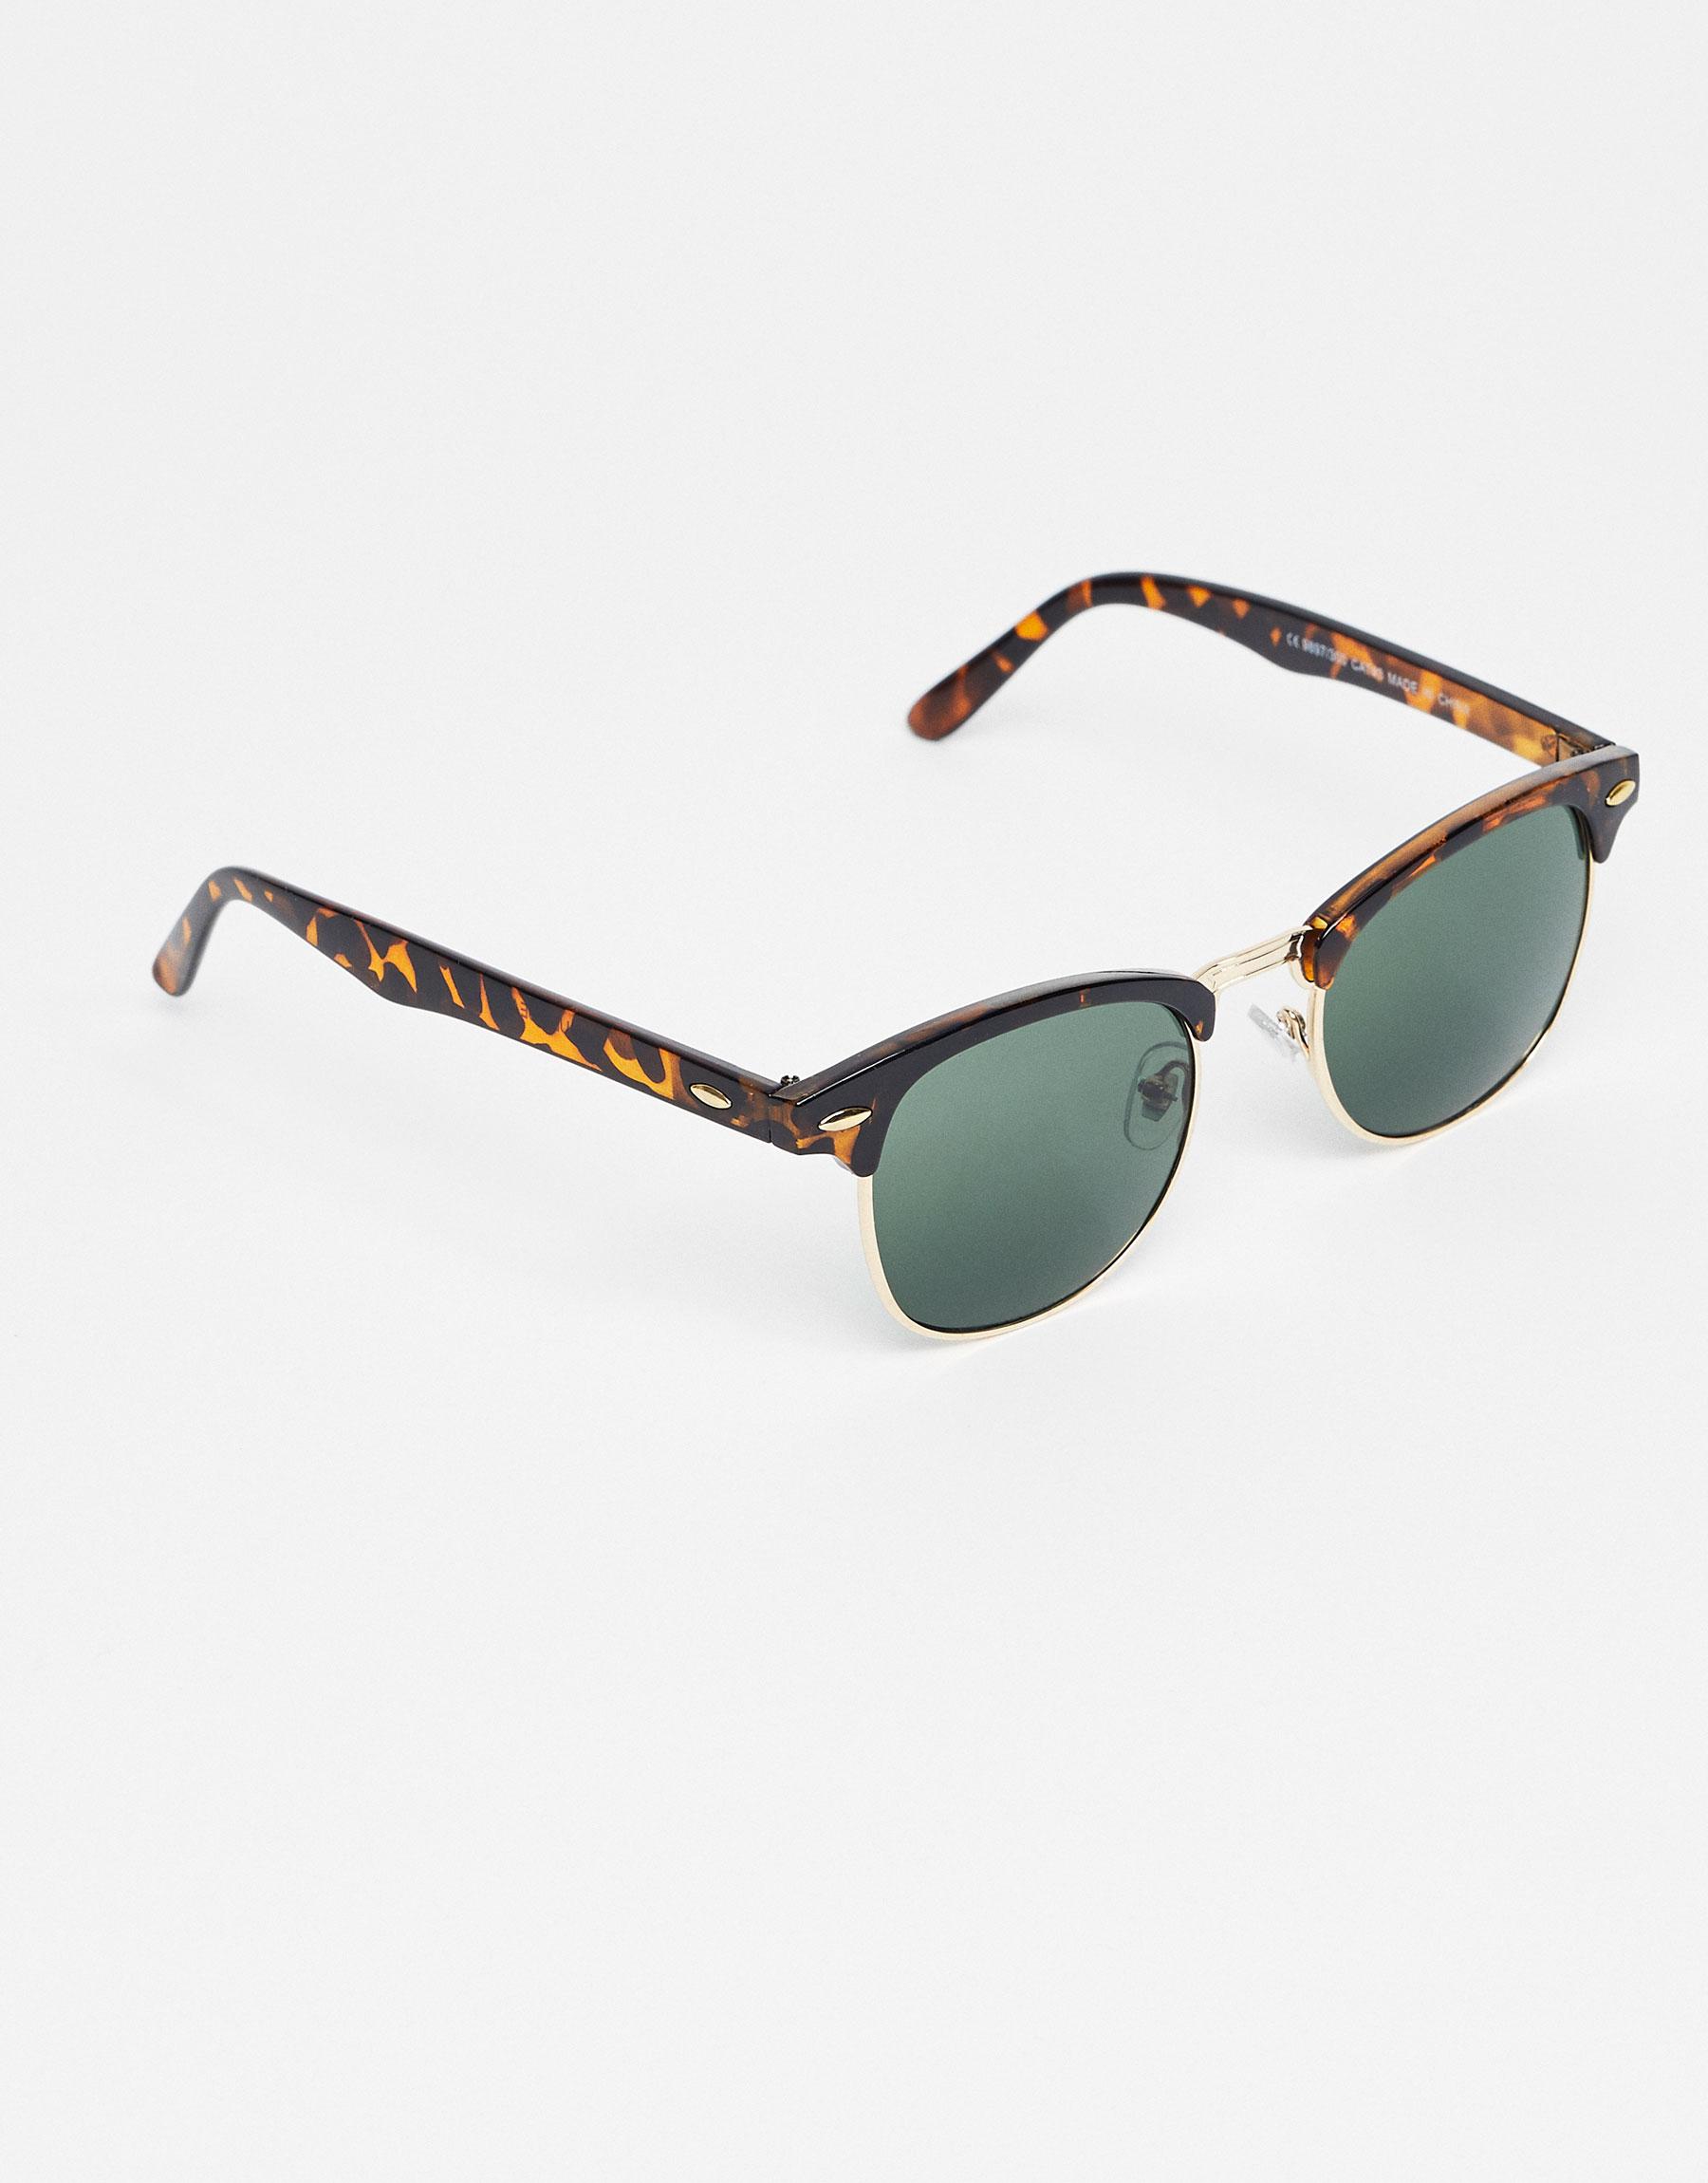 Retro-style sunglasses